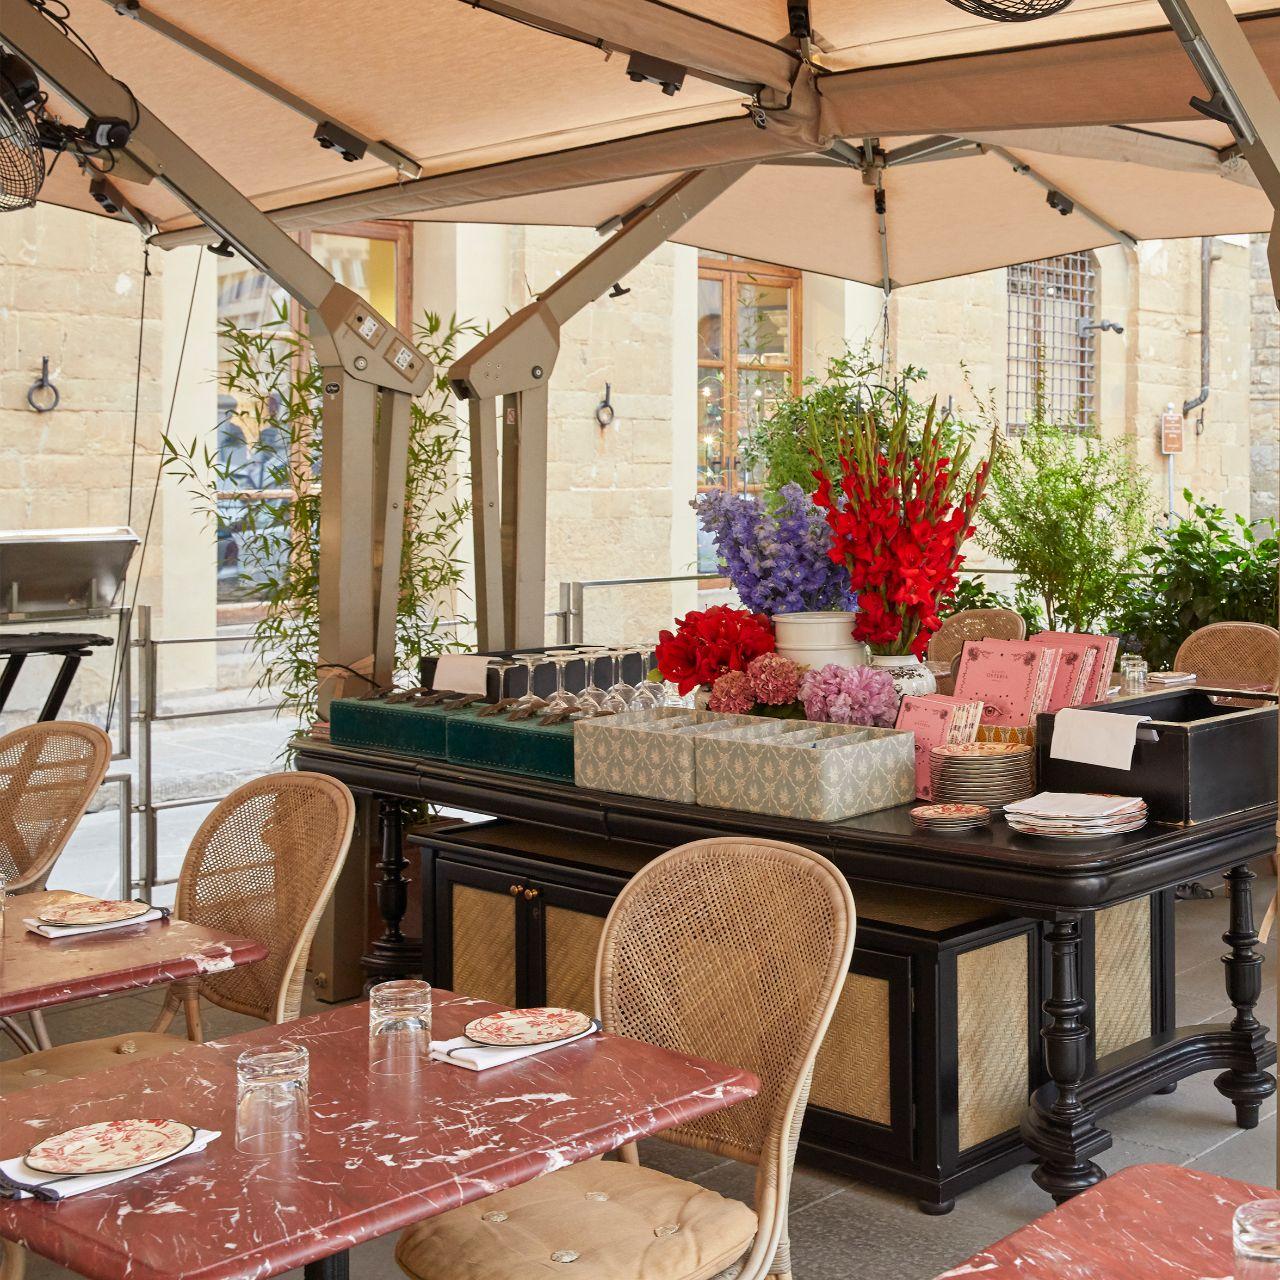 Accostamenti In Cucina gucci osteria da massimo bottura - florence, florence